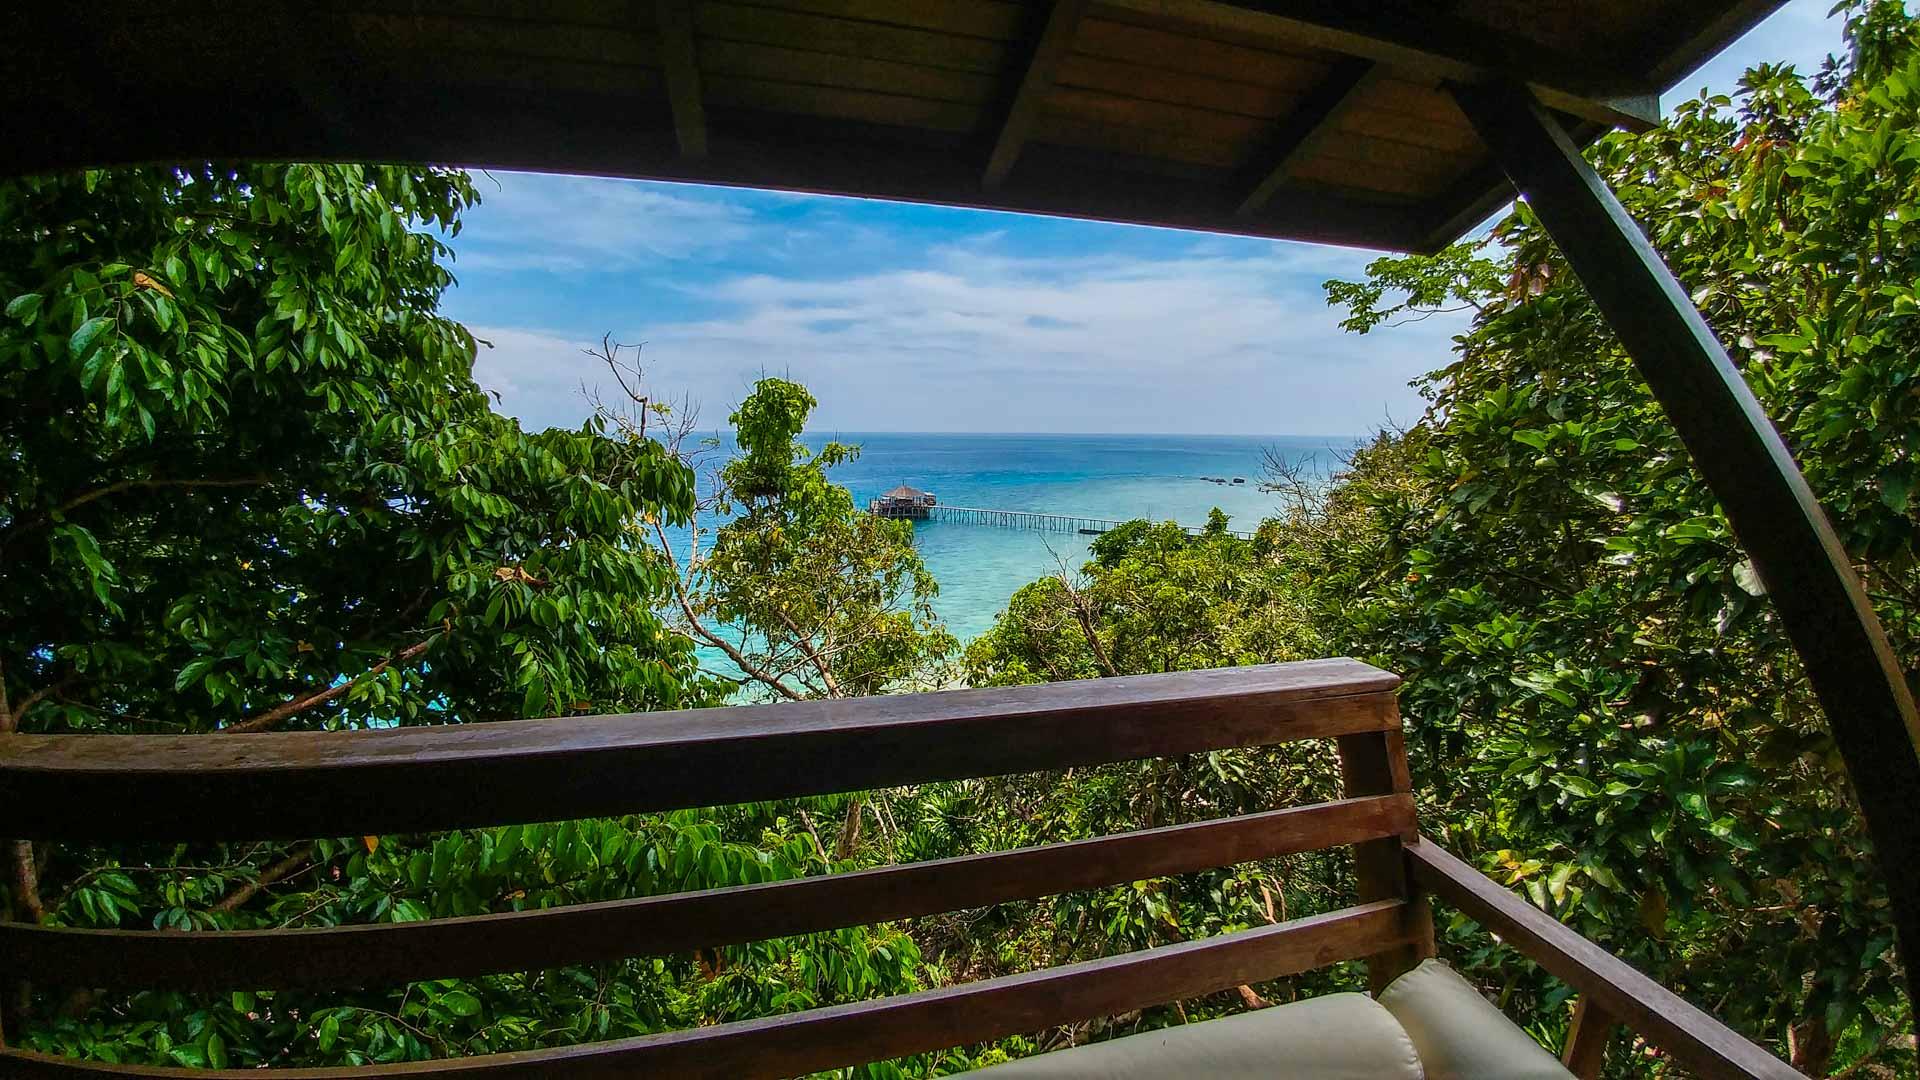 Tioman Island Malaysia Pescart Travel Photo Blog Enrico Pescantini japamala resort room